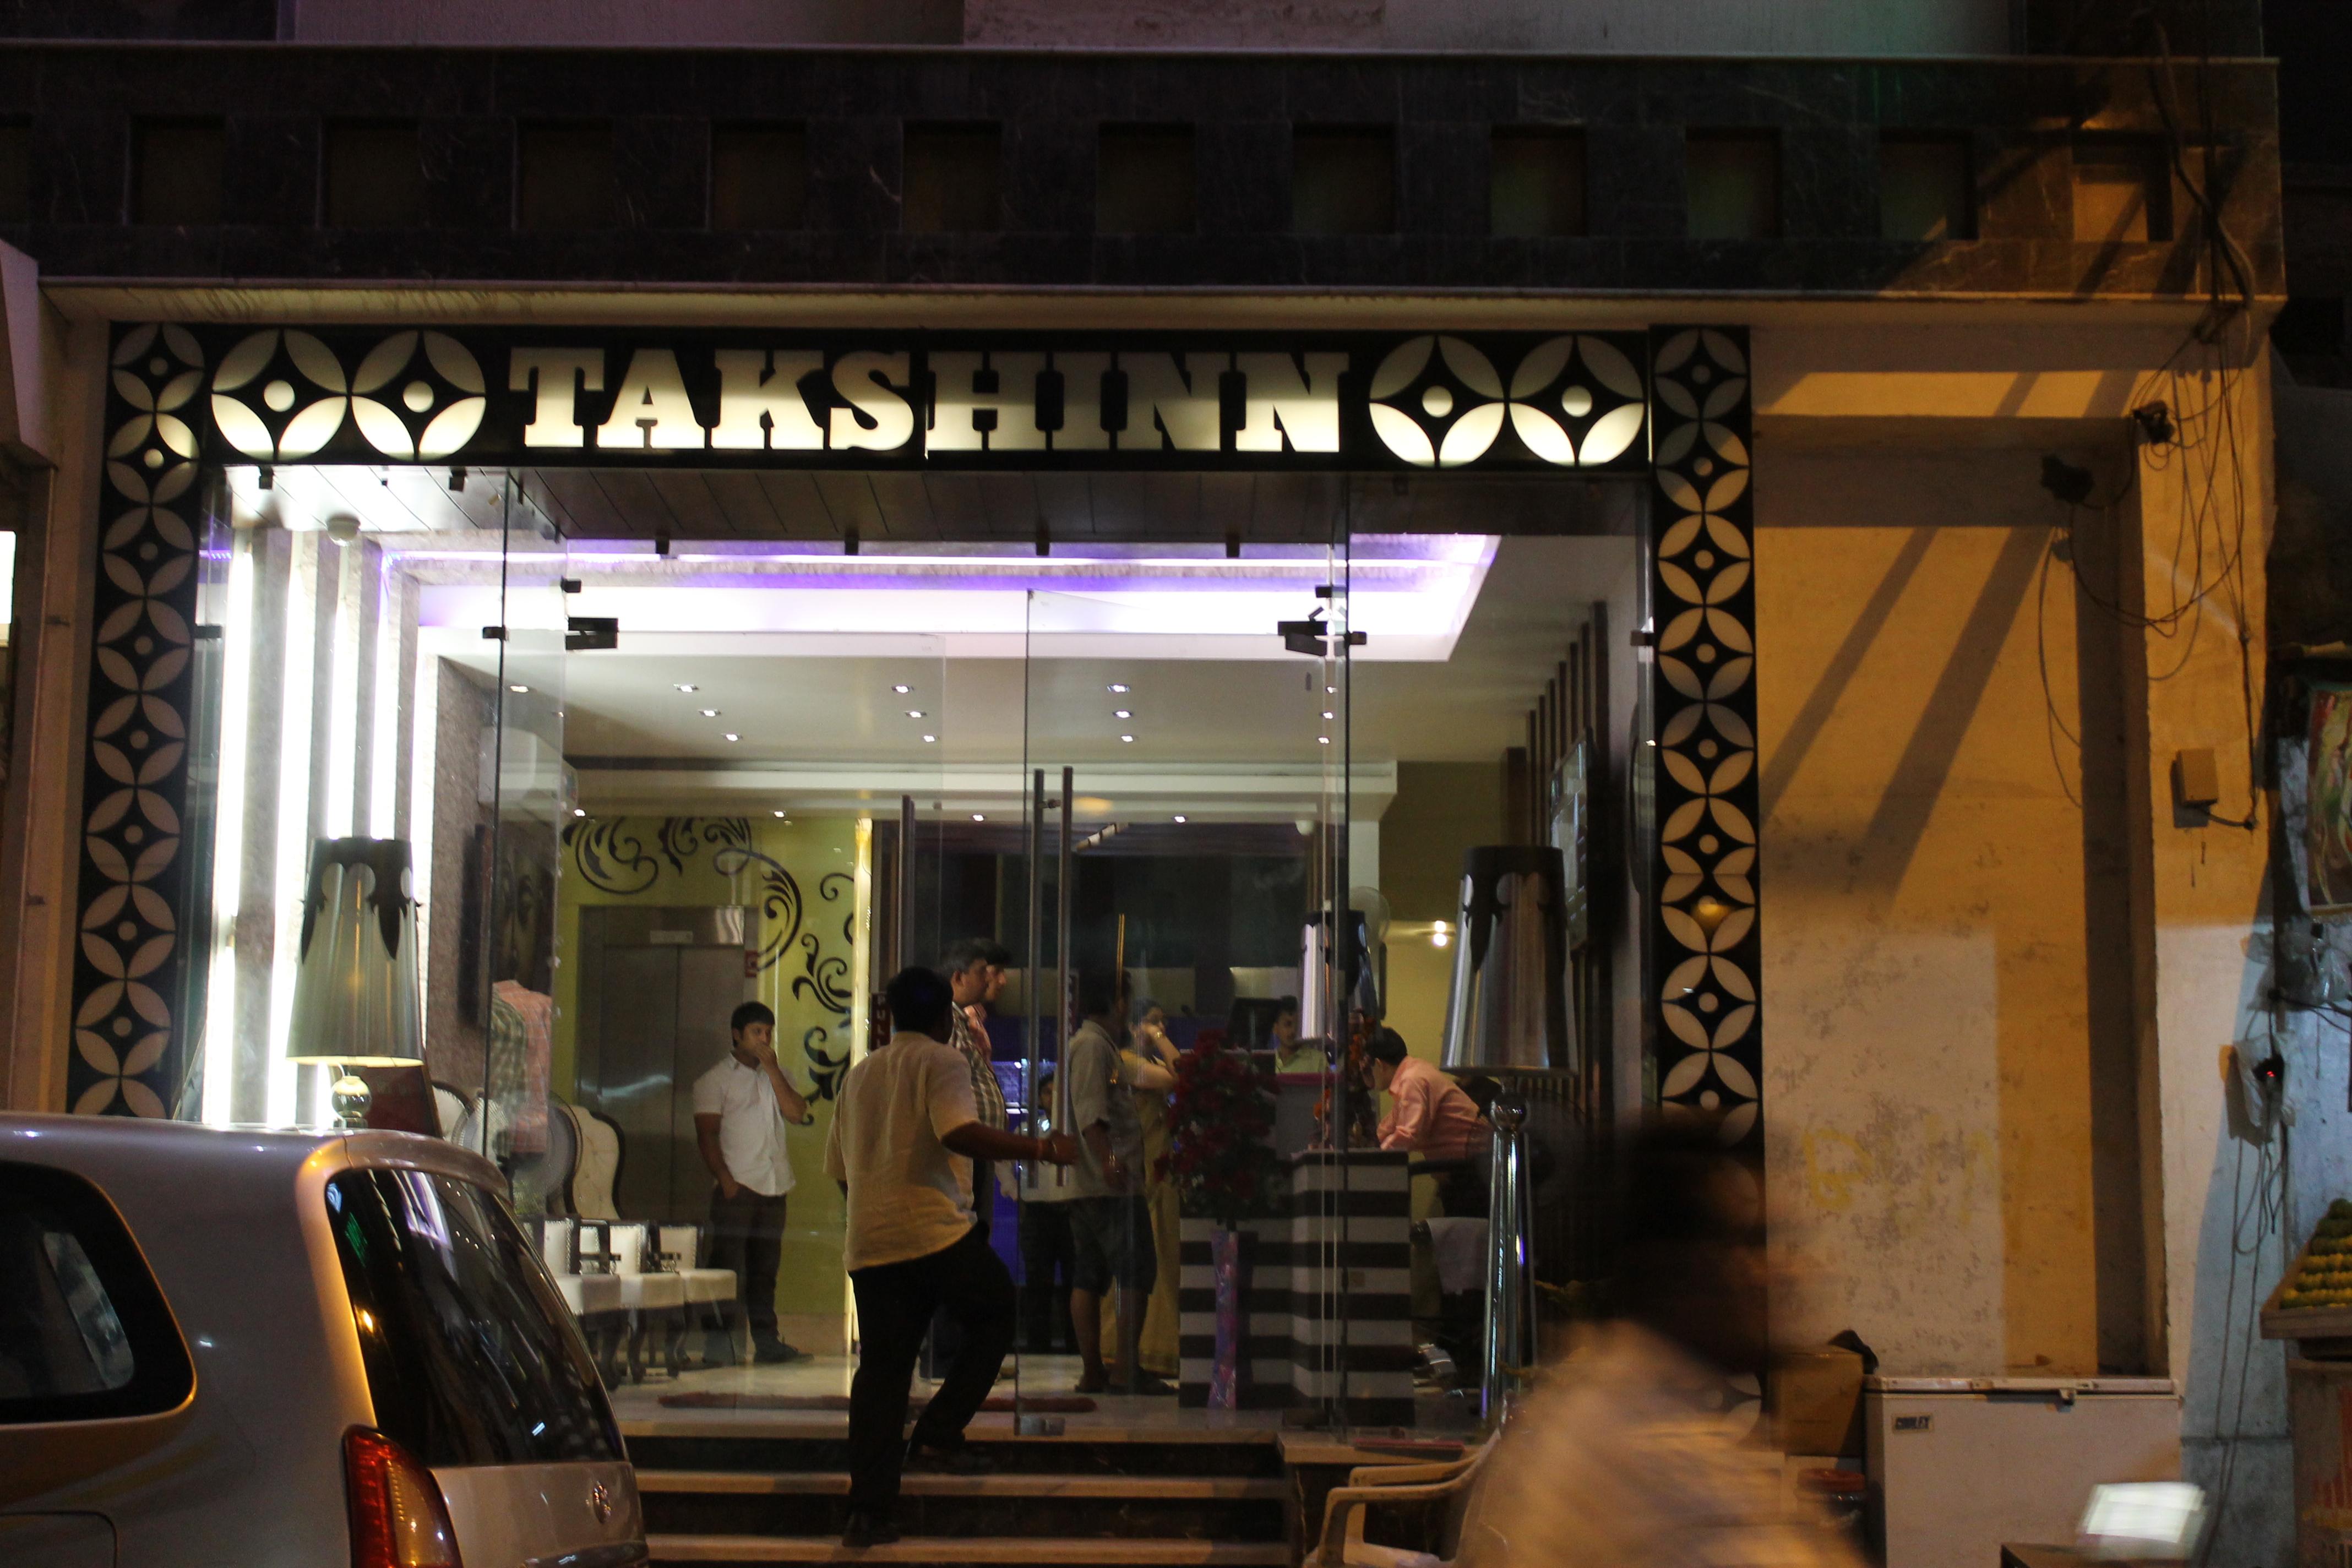 Hotel Taksh Inn